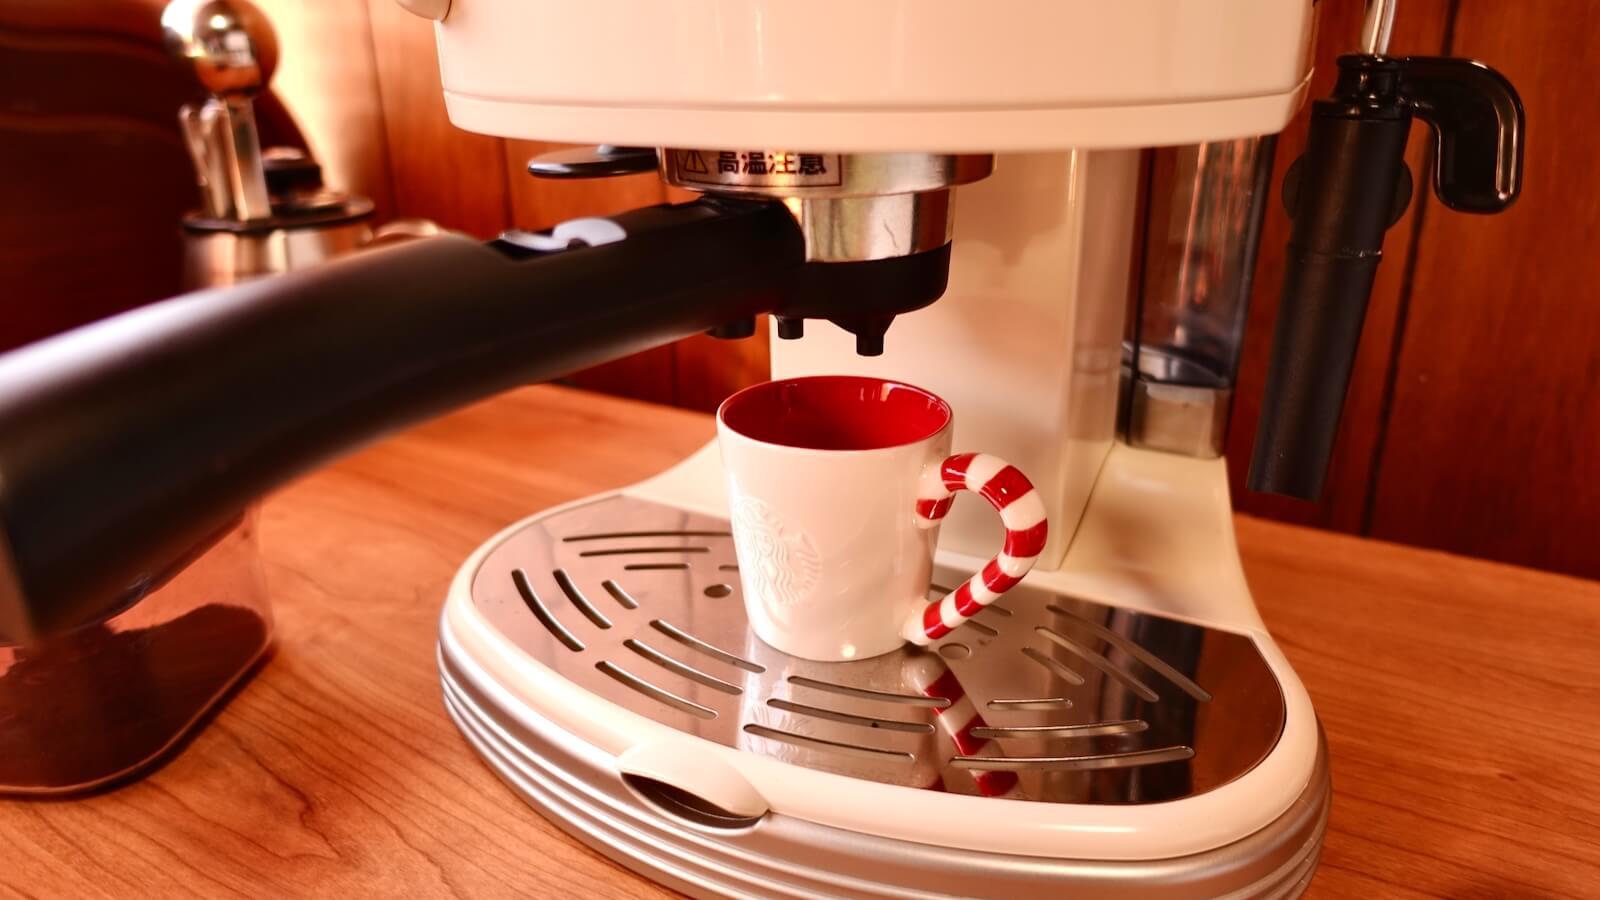 Delonghi espresso machine ECM300J Demitasse cup set photo